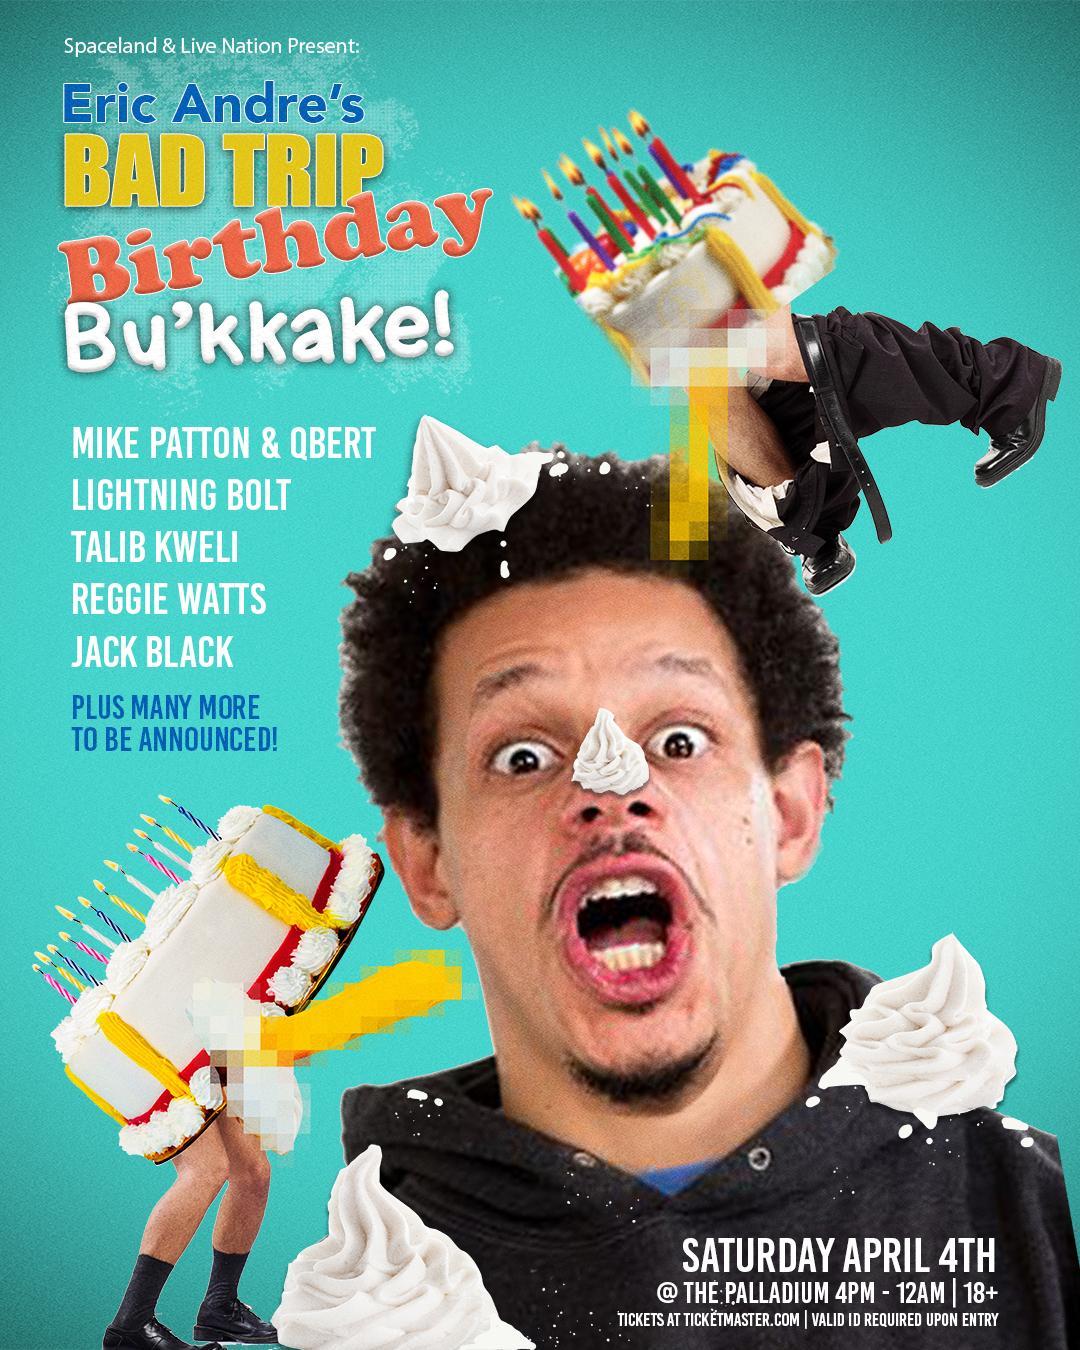 CANCELLED: ERIC ANDRE'S BAD TRIP BIRTHDAY BU'KKAKE